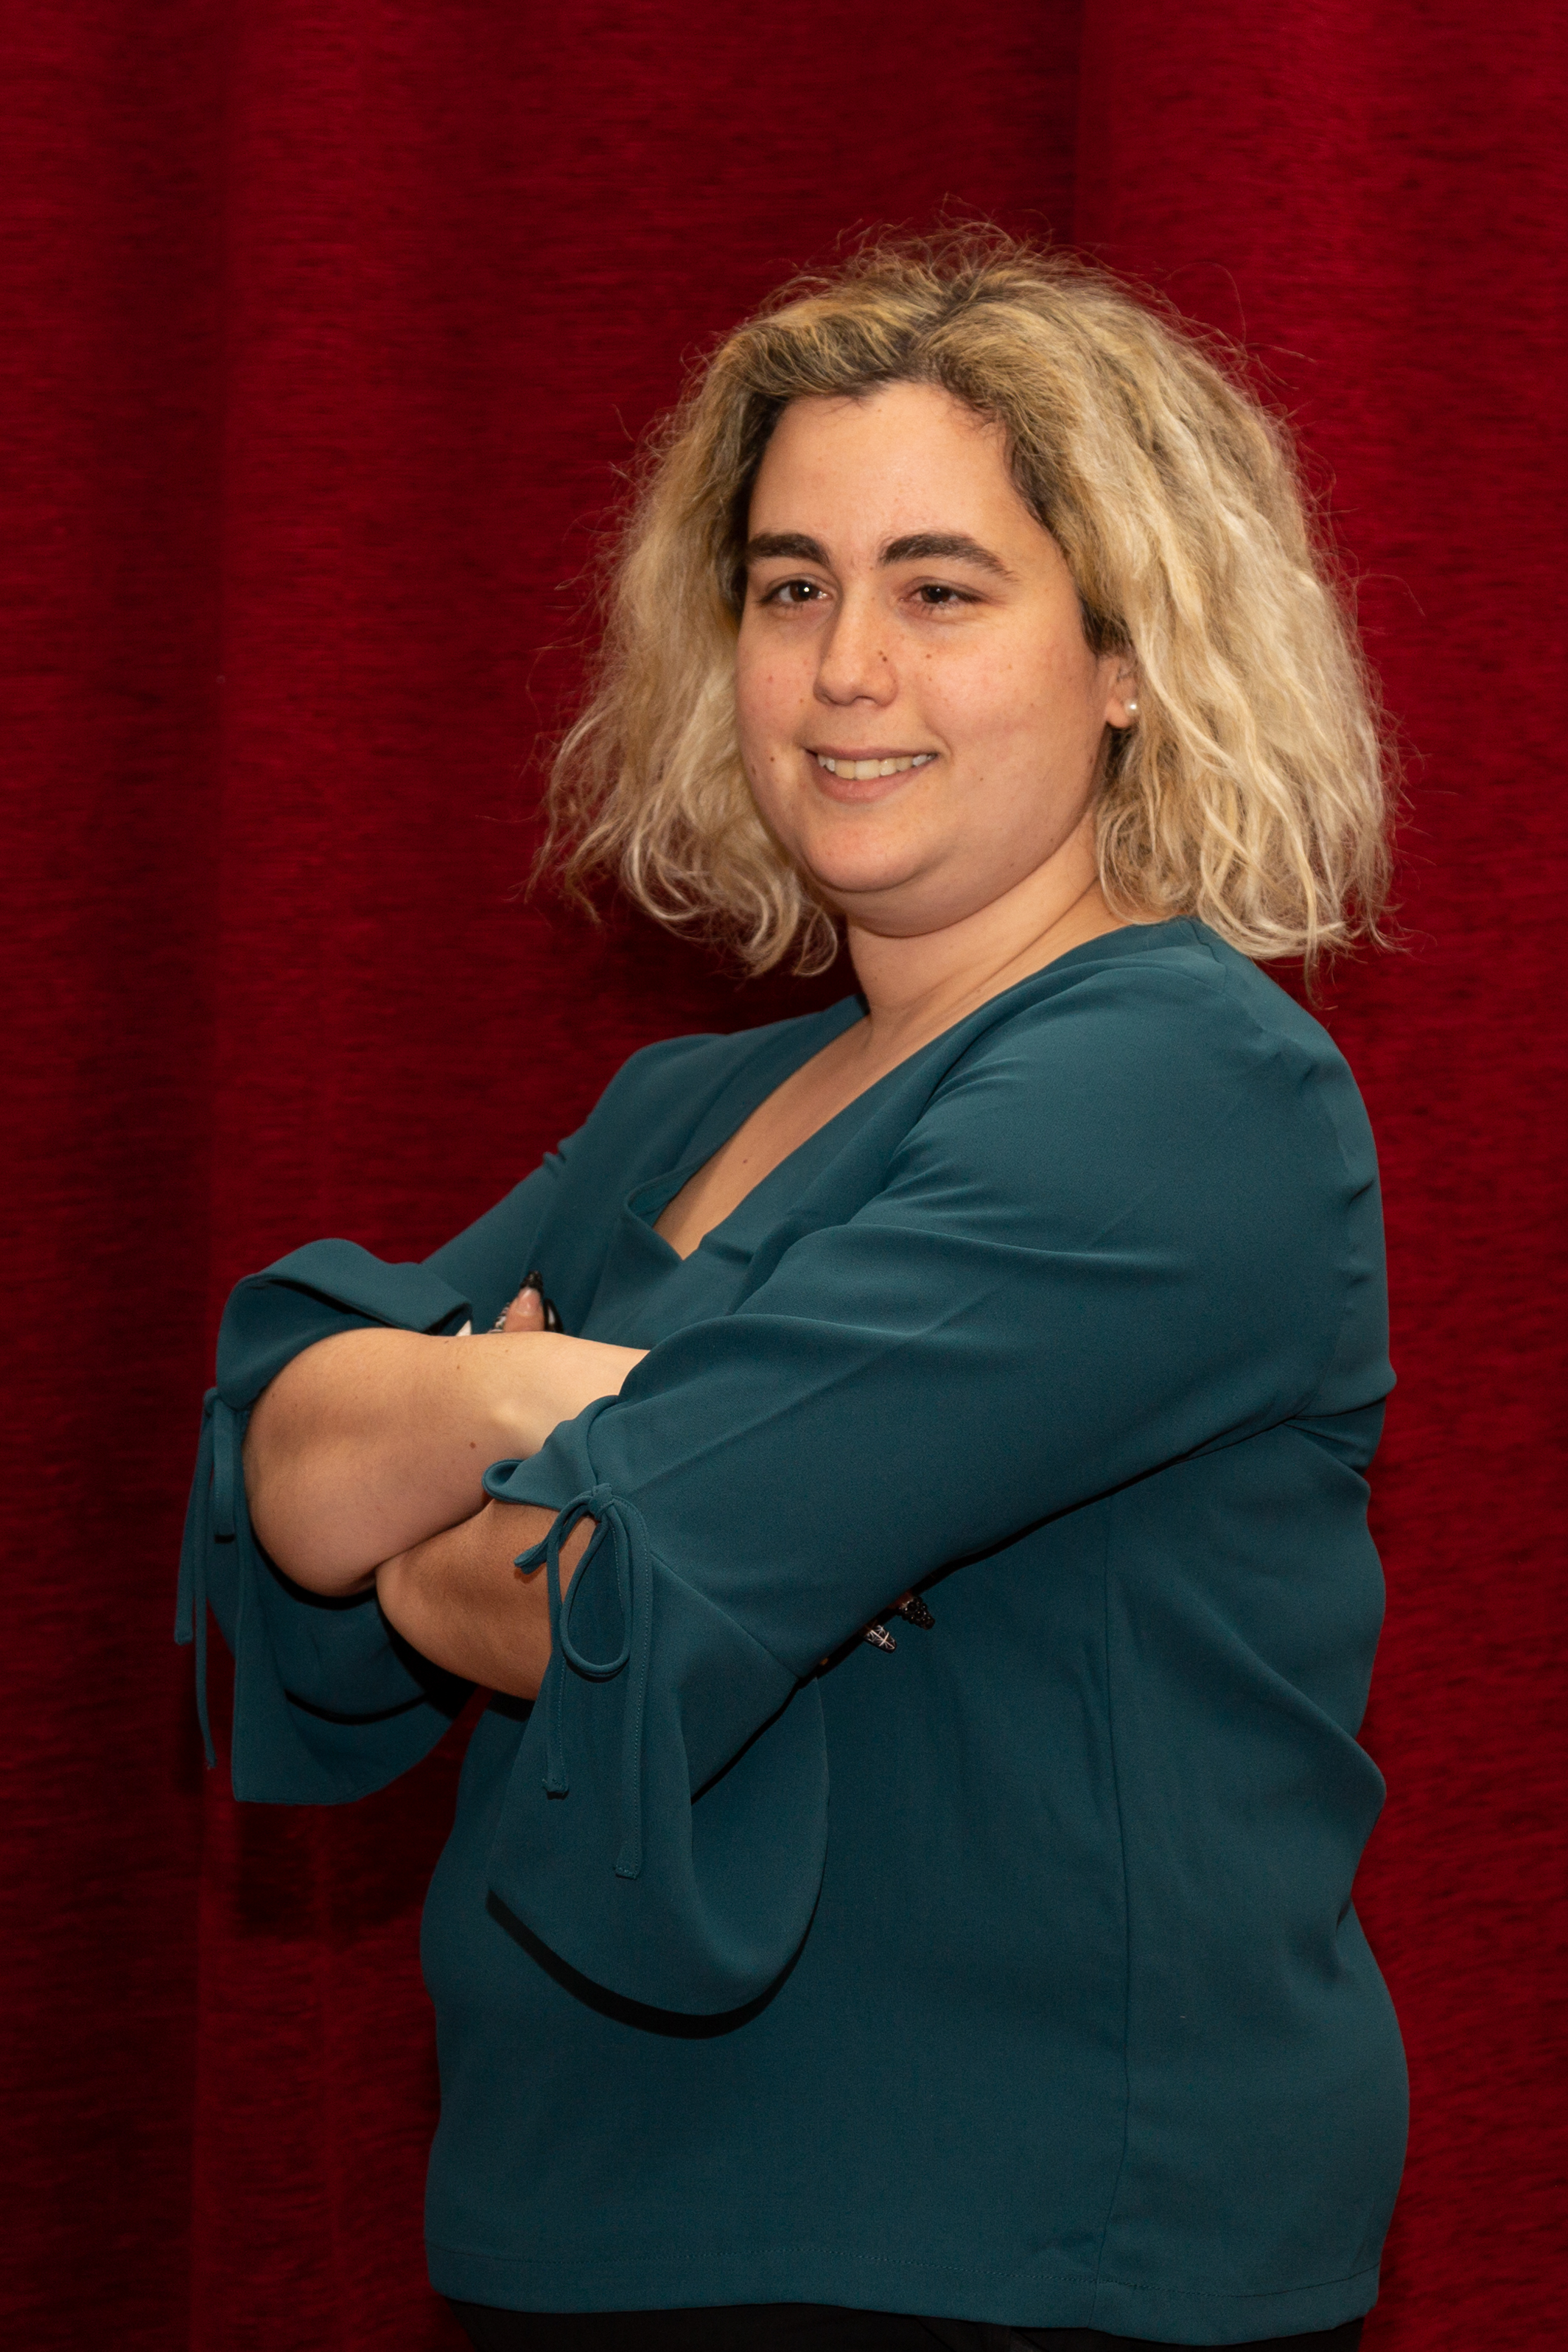 Joana Margarida Rodrigues da Costa